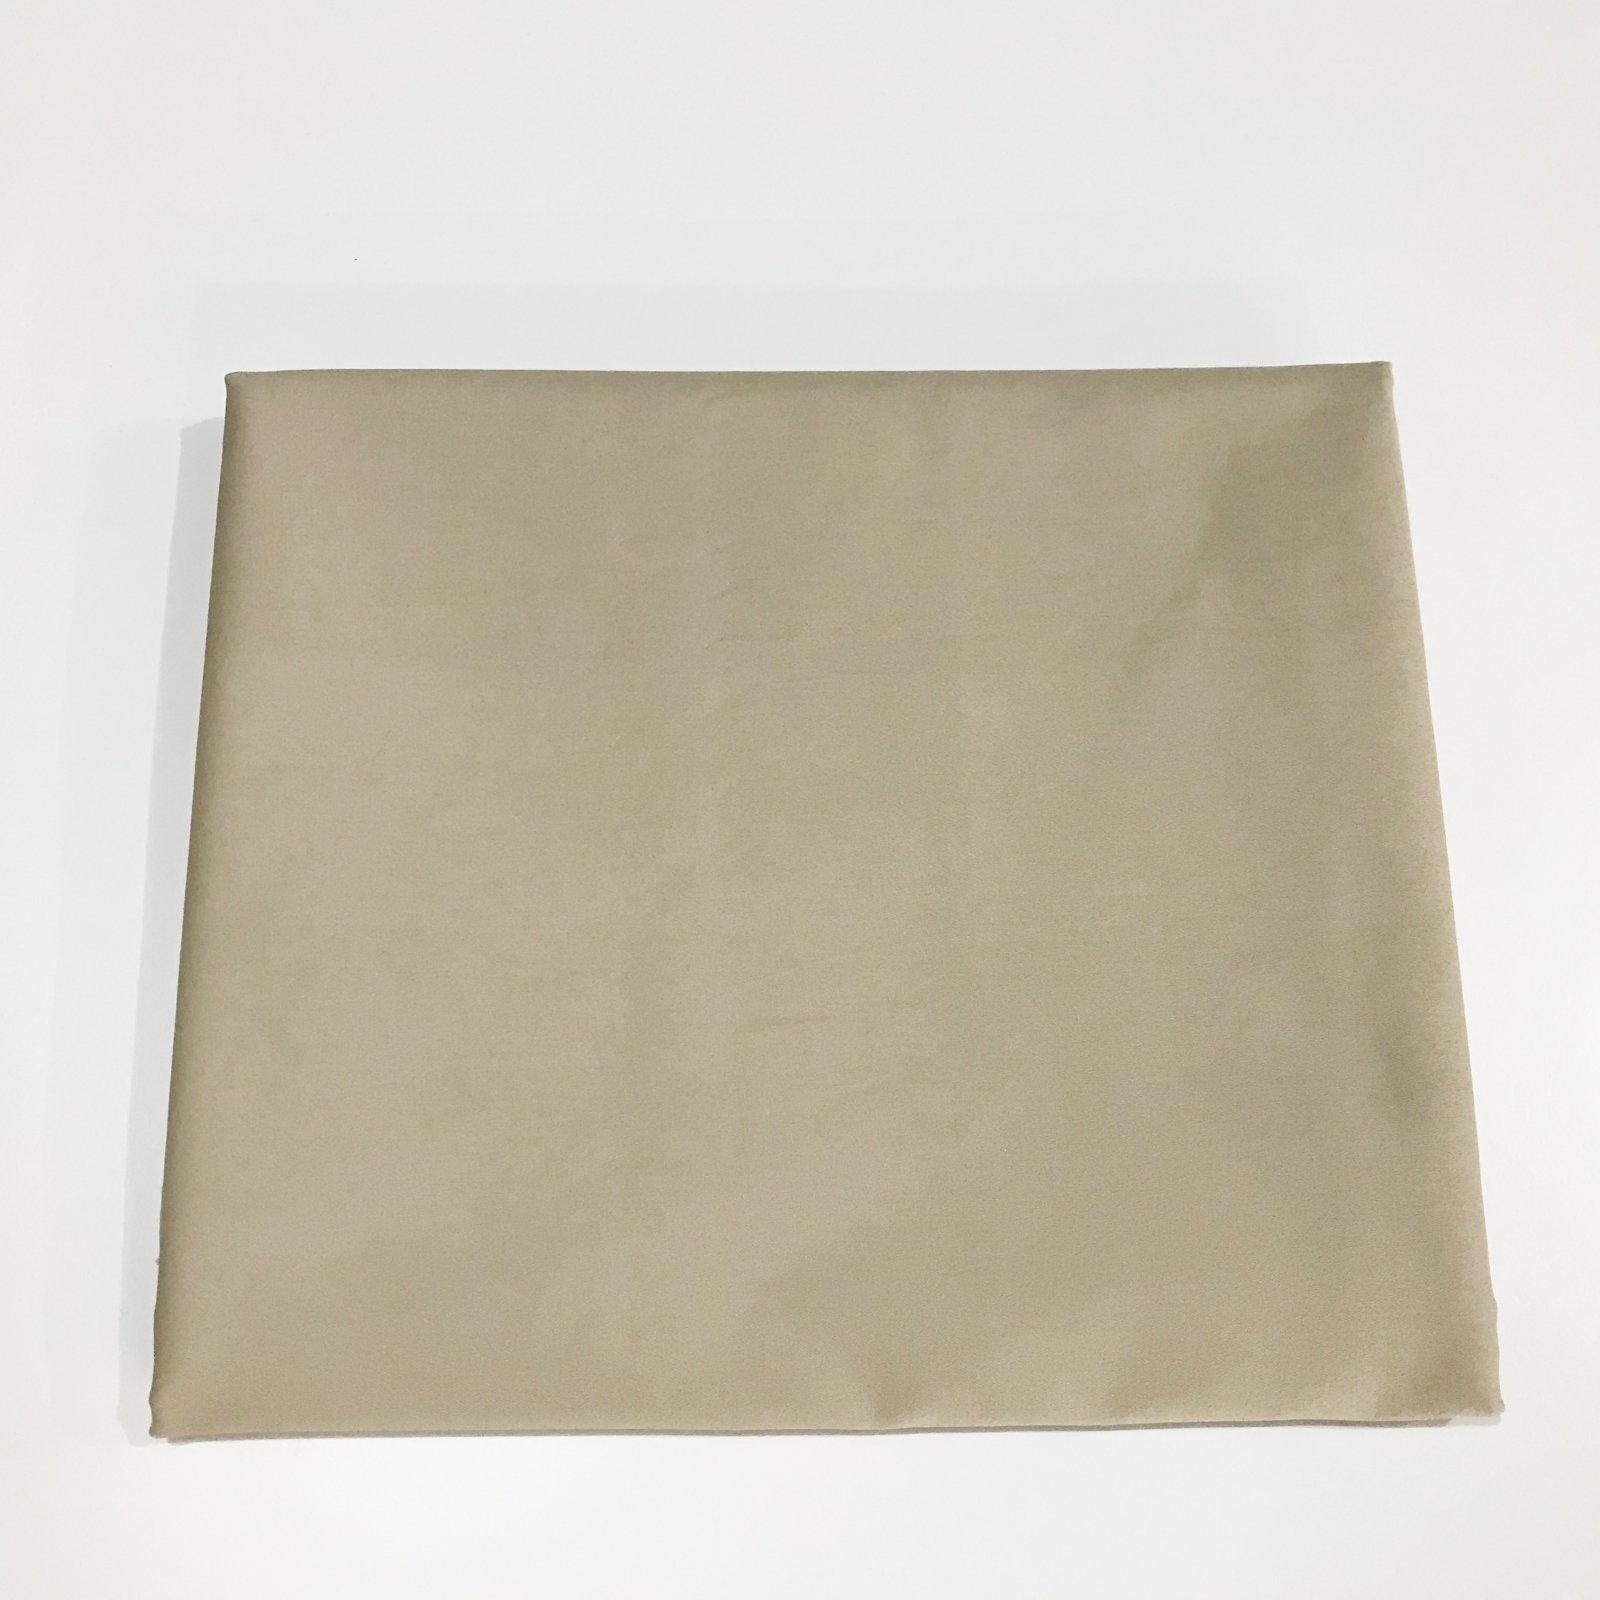 1 7/8 yards - Brushed Stretch Cotton - Tan